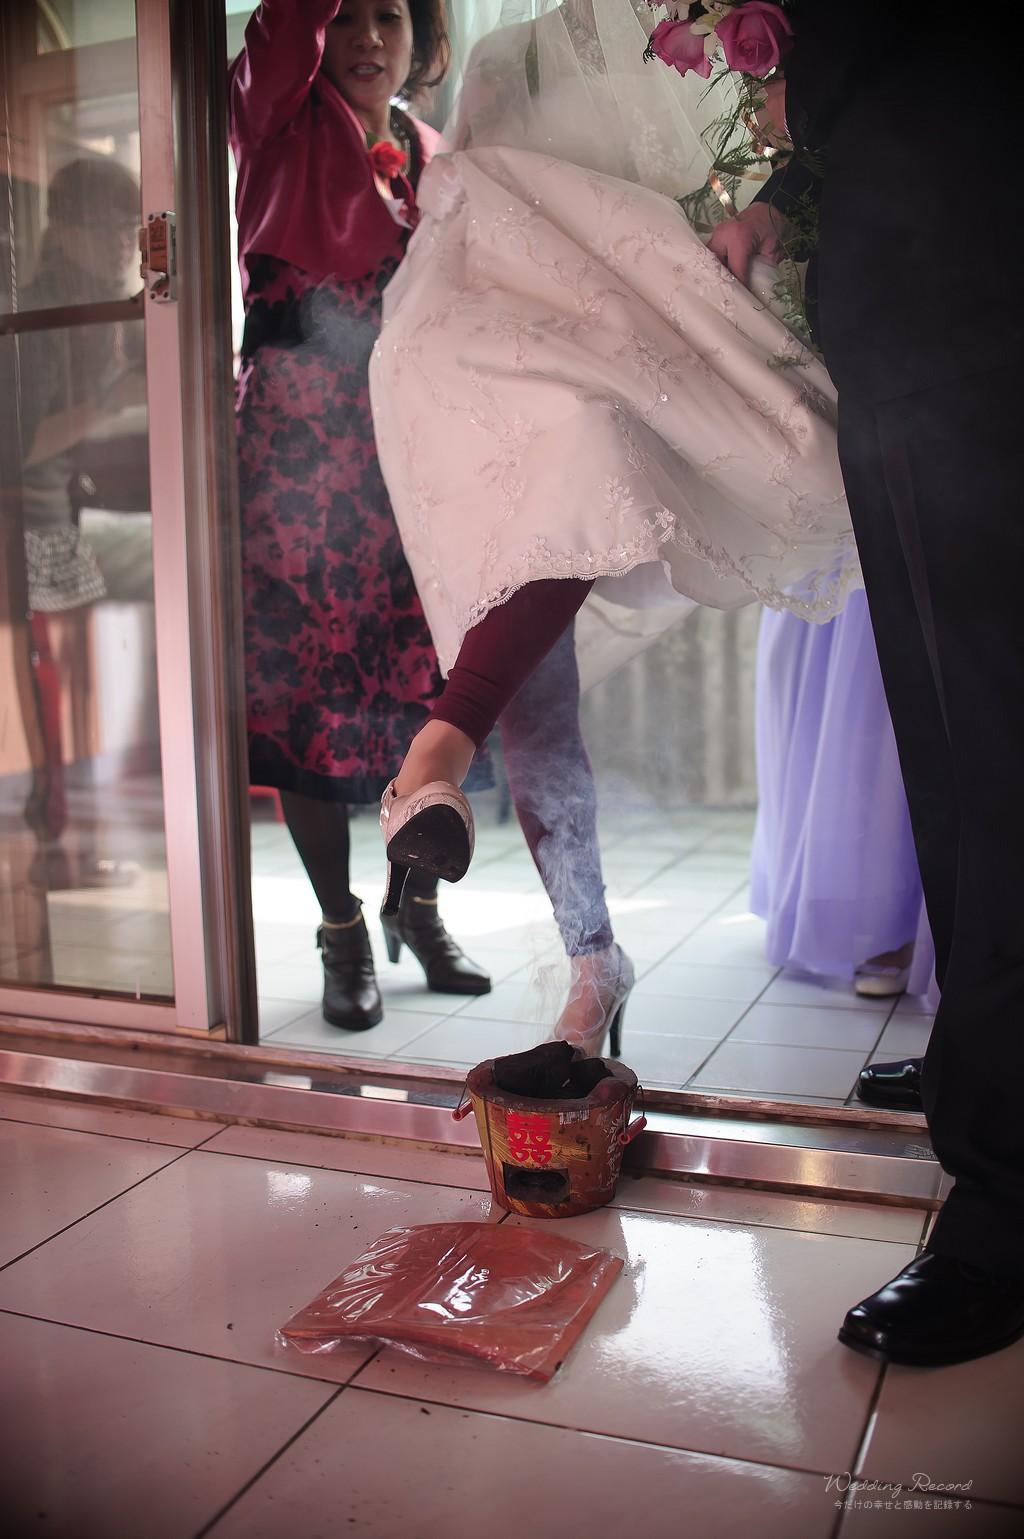 6914477224_41a6f6e777_o-法豆影像工作室_婚攝, 婚禮攝影, 婚禮紀錄, 婚紗攝影, 自助婚紗, 婚攝推薦, 攝影棚出租, 攝影棚租借, 孕婦禮服出租, 孕婦禮服租借, CEO專業形象照, 形像照, 型像照, 型象照. 形象照團拍, 全家福, 全家福團拍, 招團, 揪團拍, 親子寫真, 家庭寫真, 抓周, 抓周團拍